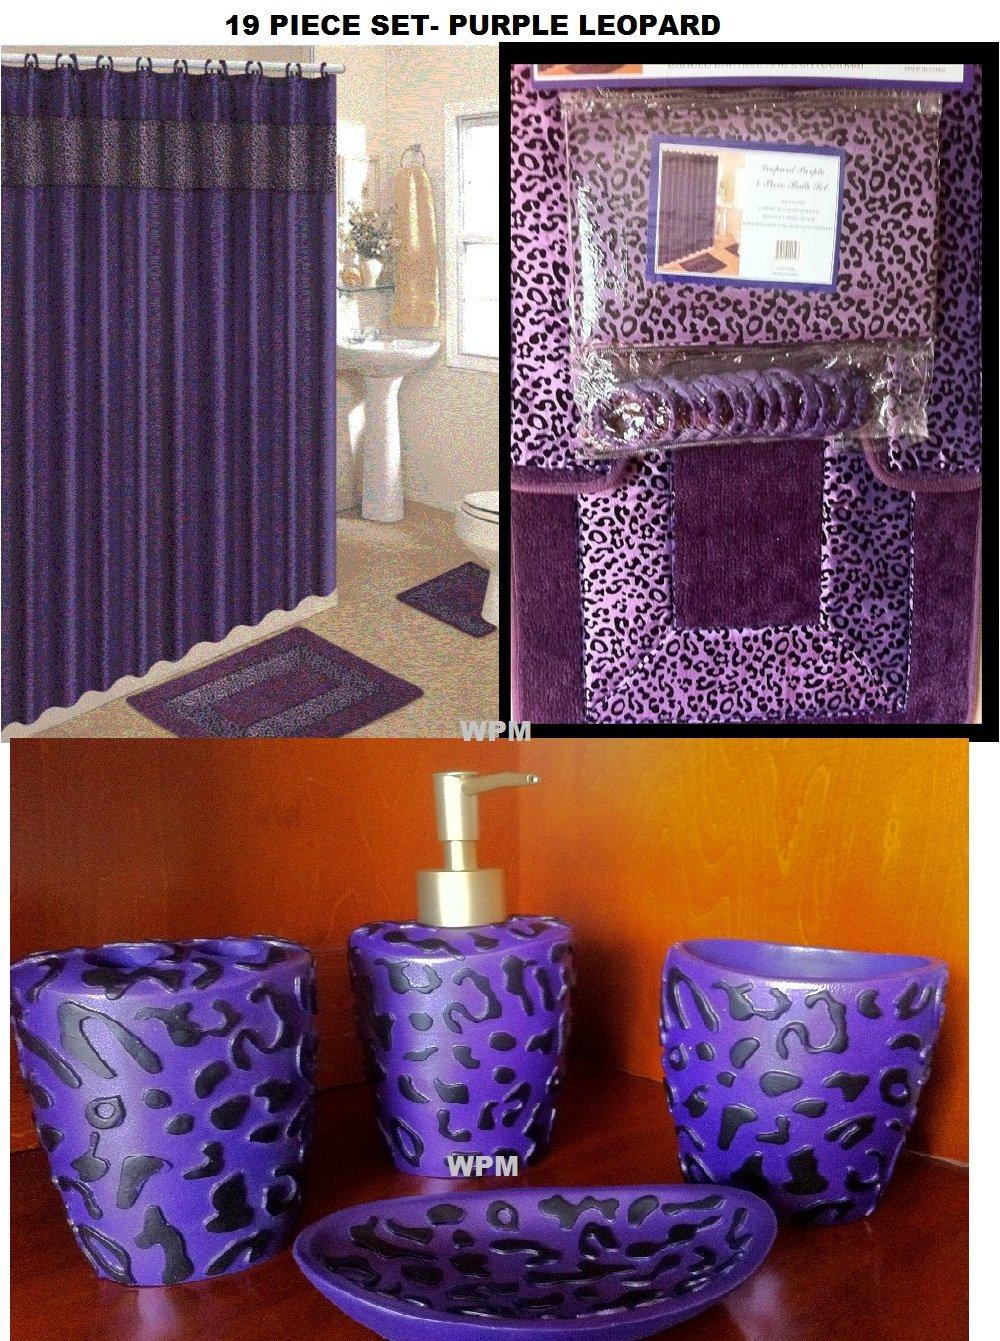 Amazon com  19 Piece Bath Accessory Set Purple Leopard Bathroom Rugs    Shower Curtain   Accessories  Home   Kitchen. Amazon com  19 Piece Bath Accessory Set Purple Leopard Bathroom